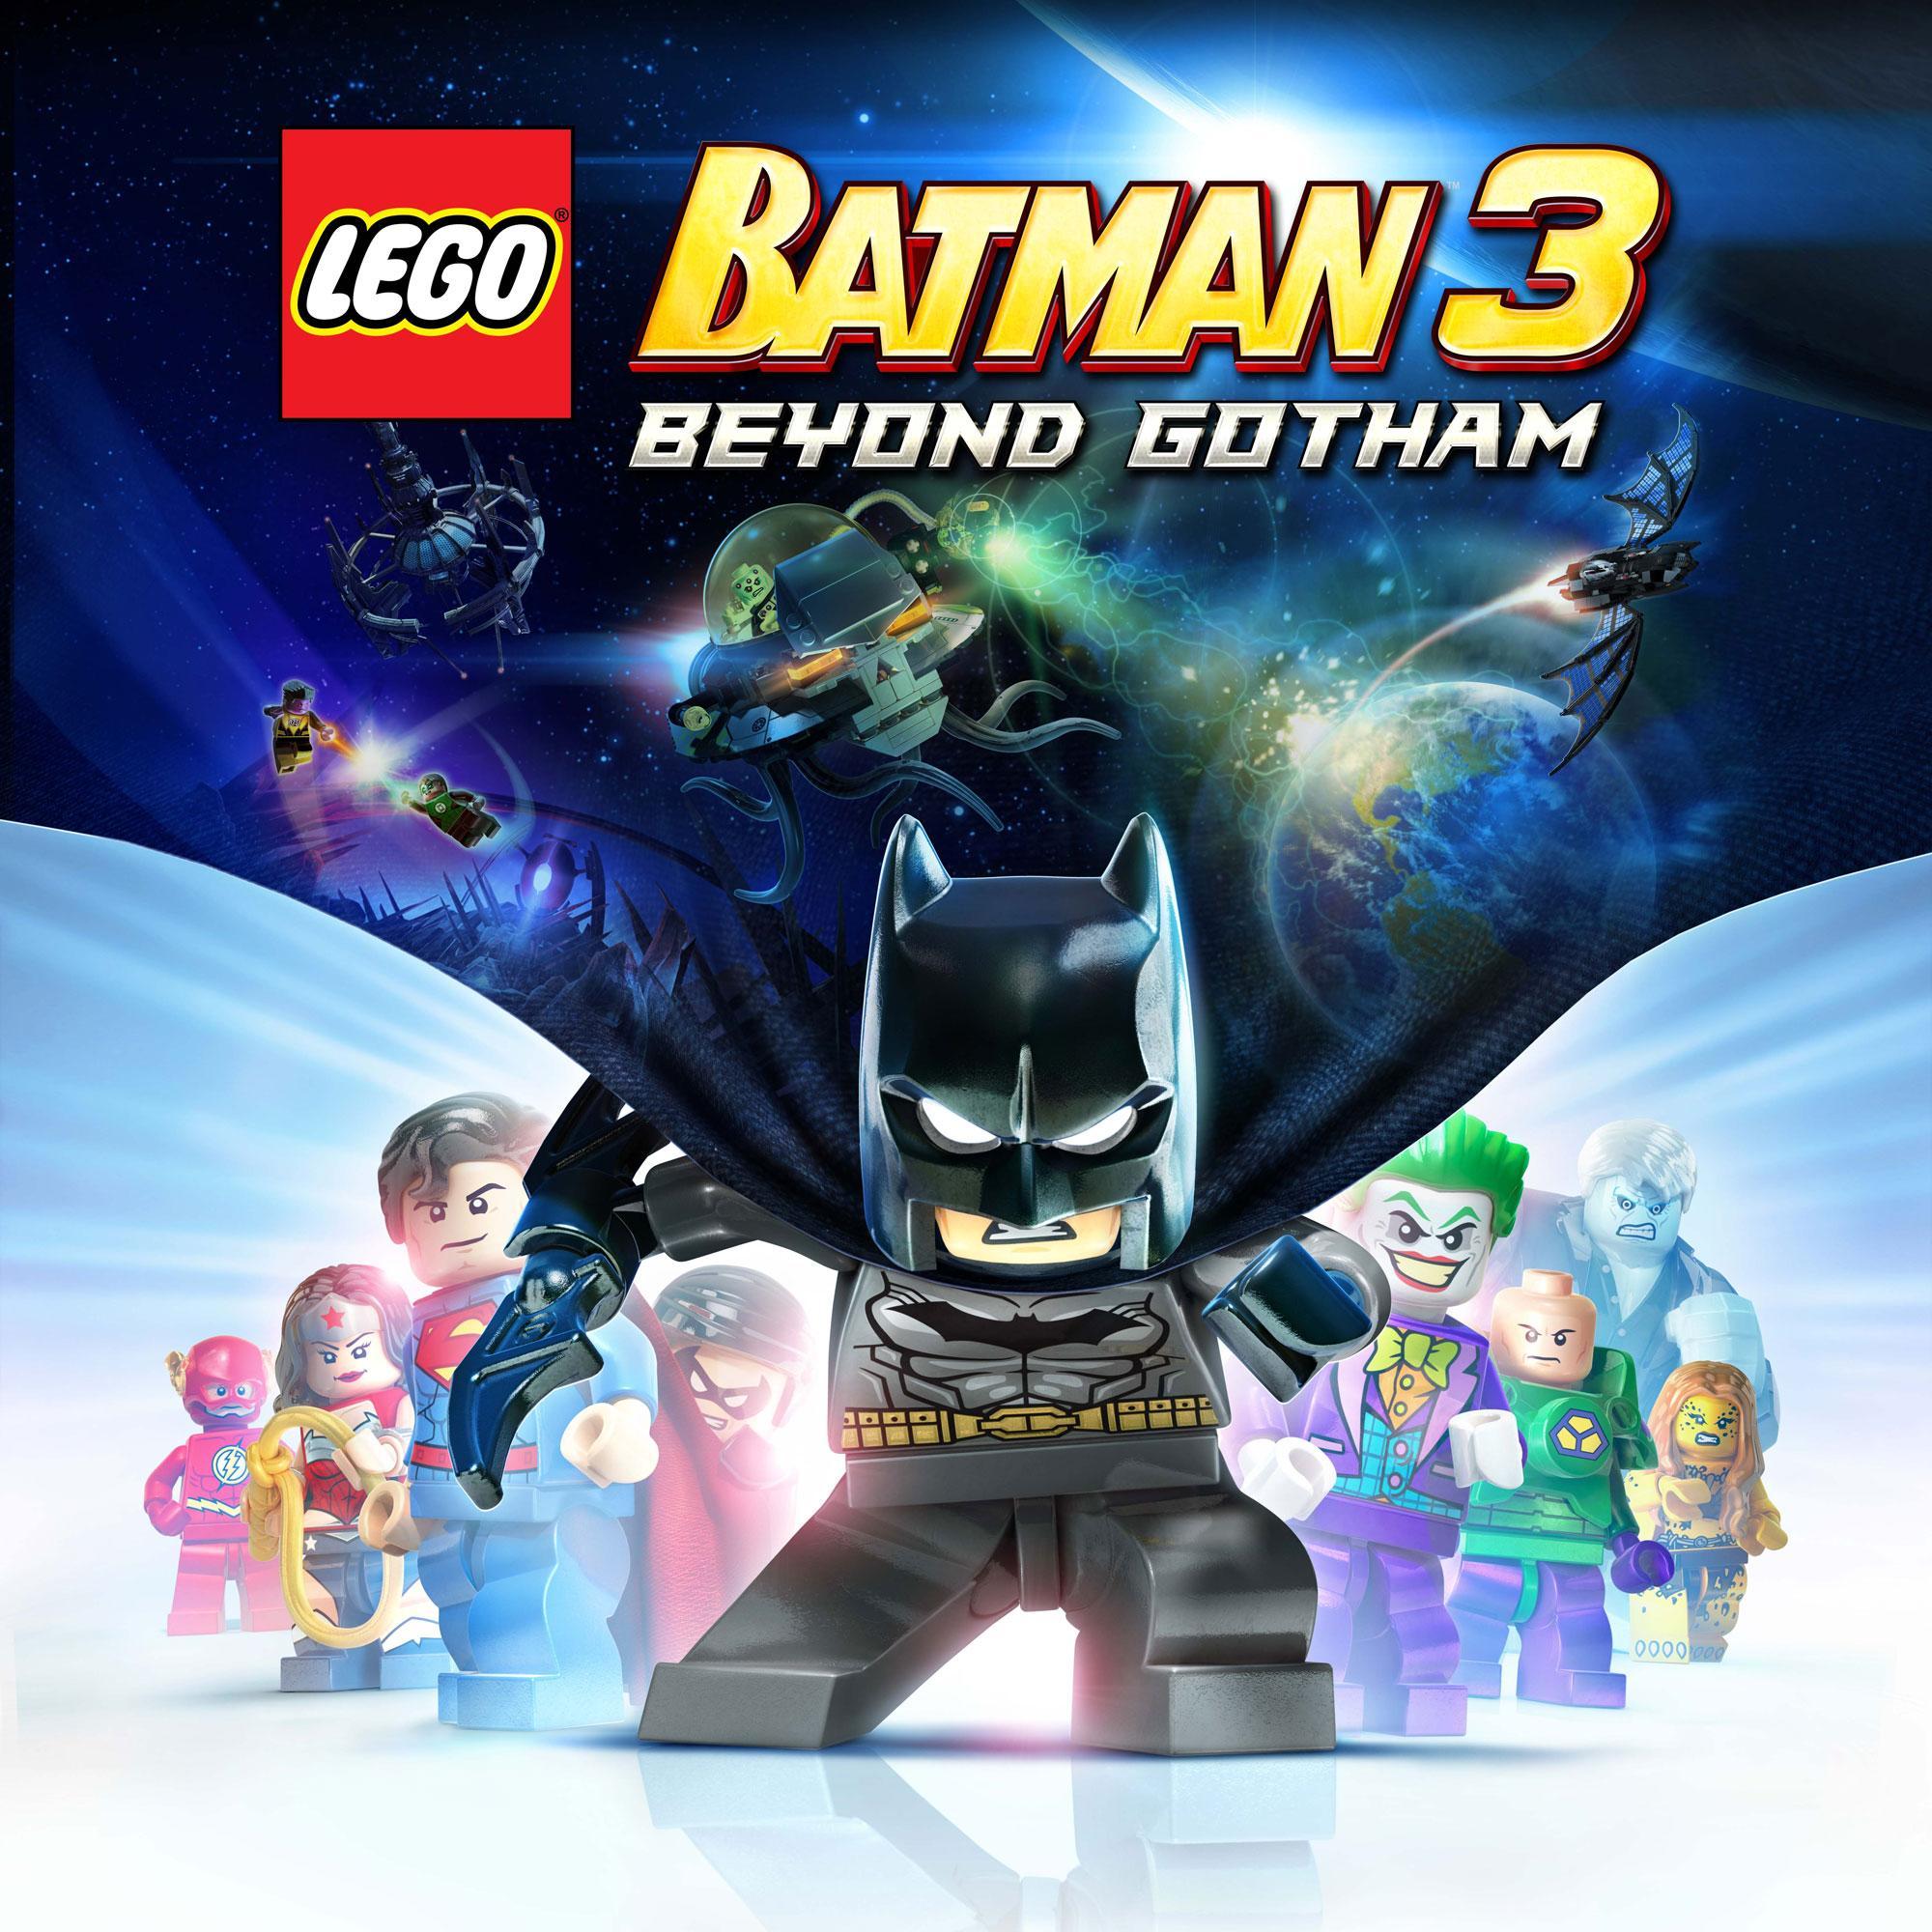 LEGO MARVEL /& DC Mini Figures Genuine 2019 Super Heroes Avengers Justice League